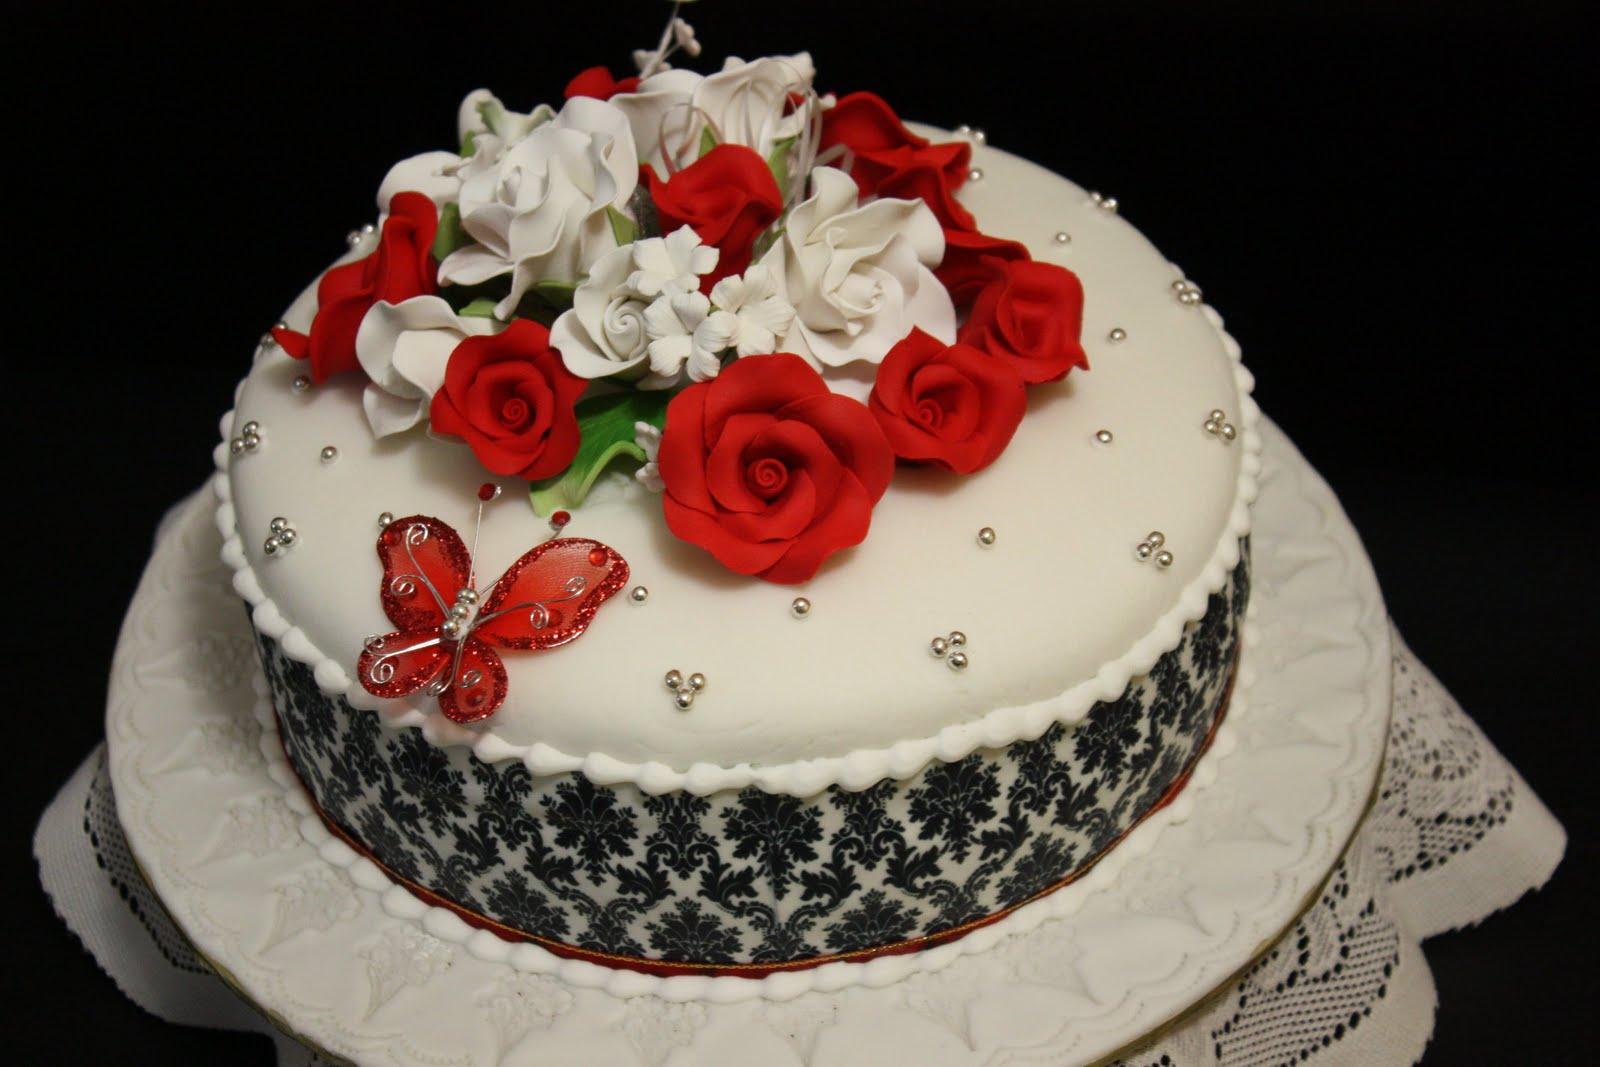 moist choc cake in black